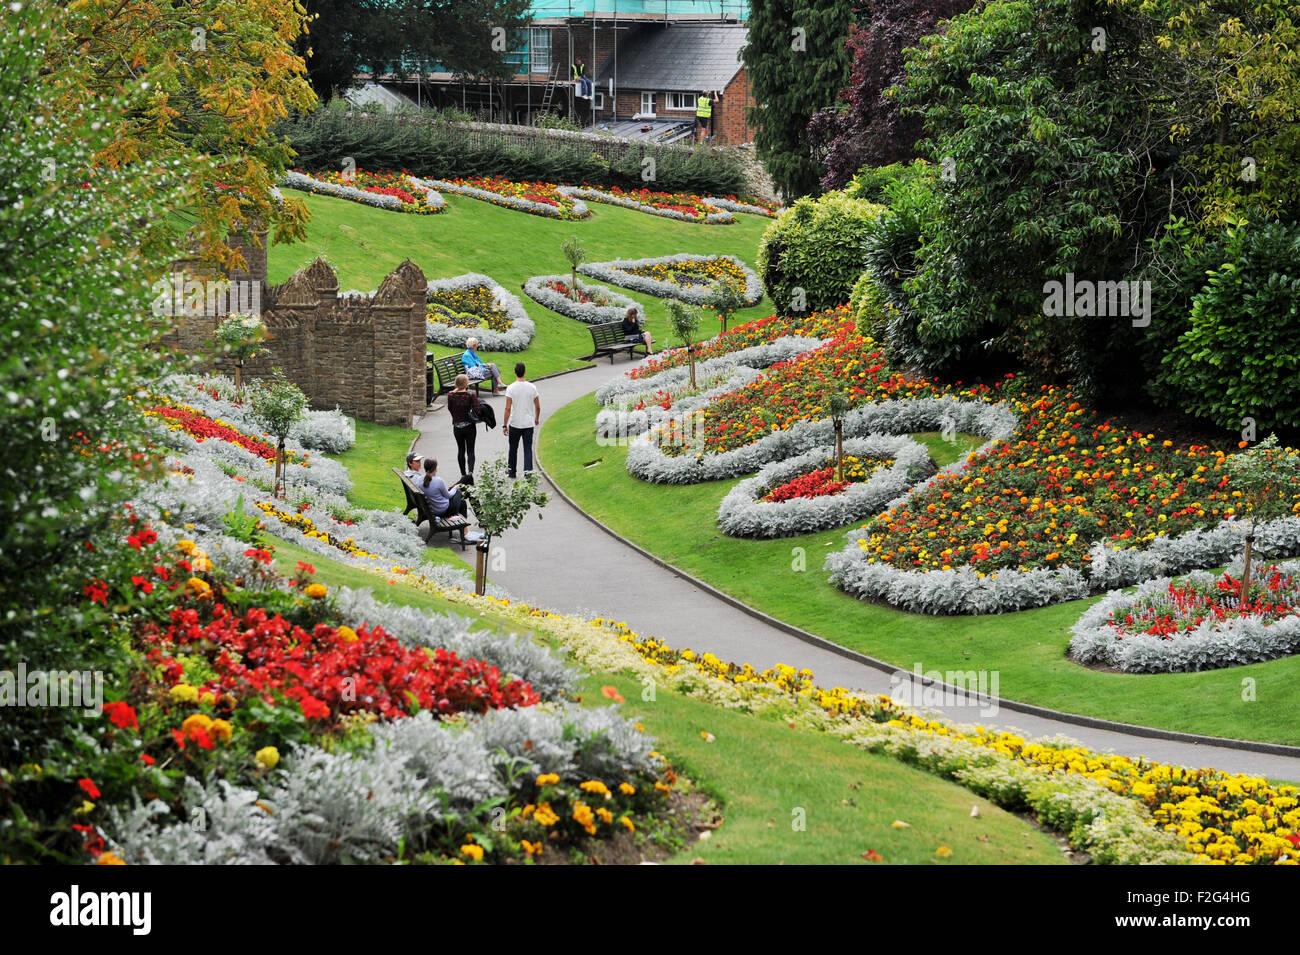 guildford surrey uk alice in wonderland themed gardens in the castle grounds stock image - Alice In Wonderland Garden